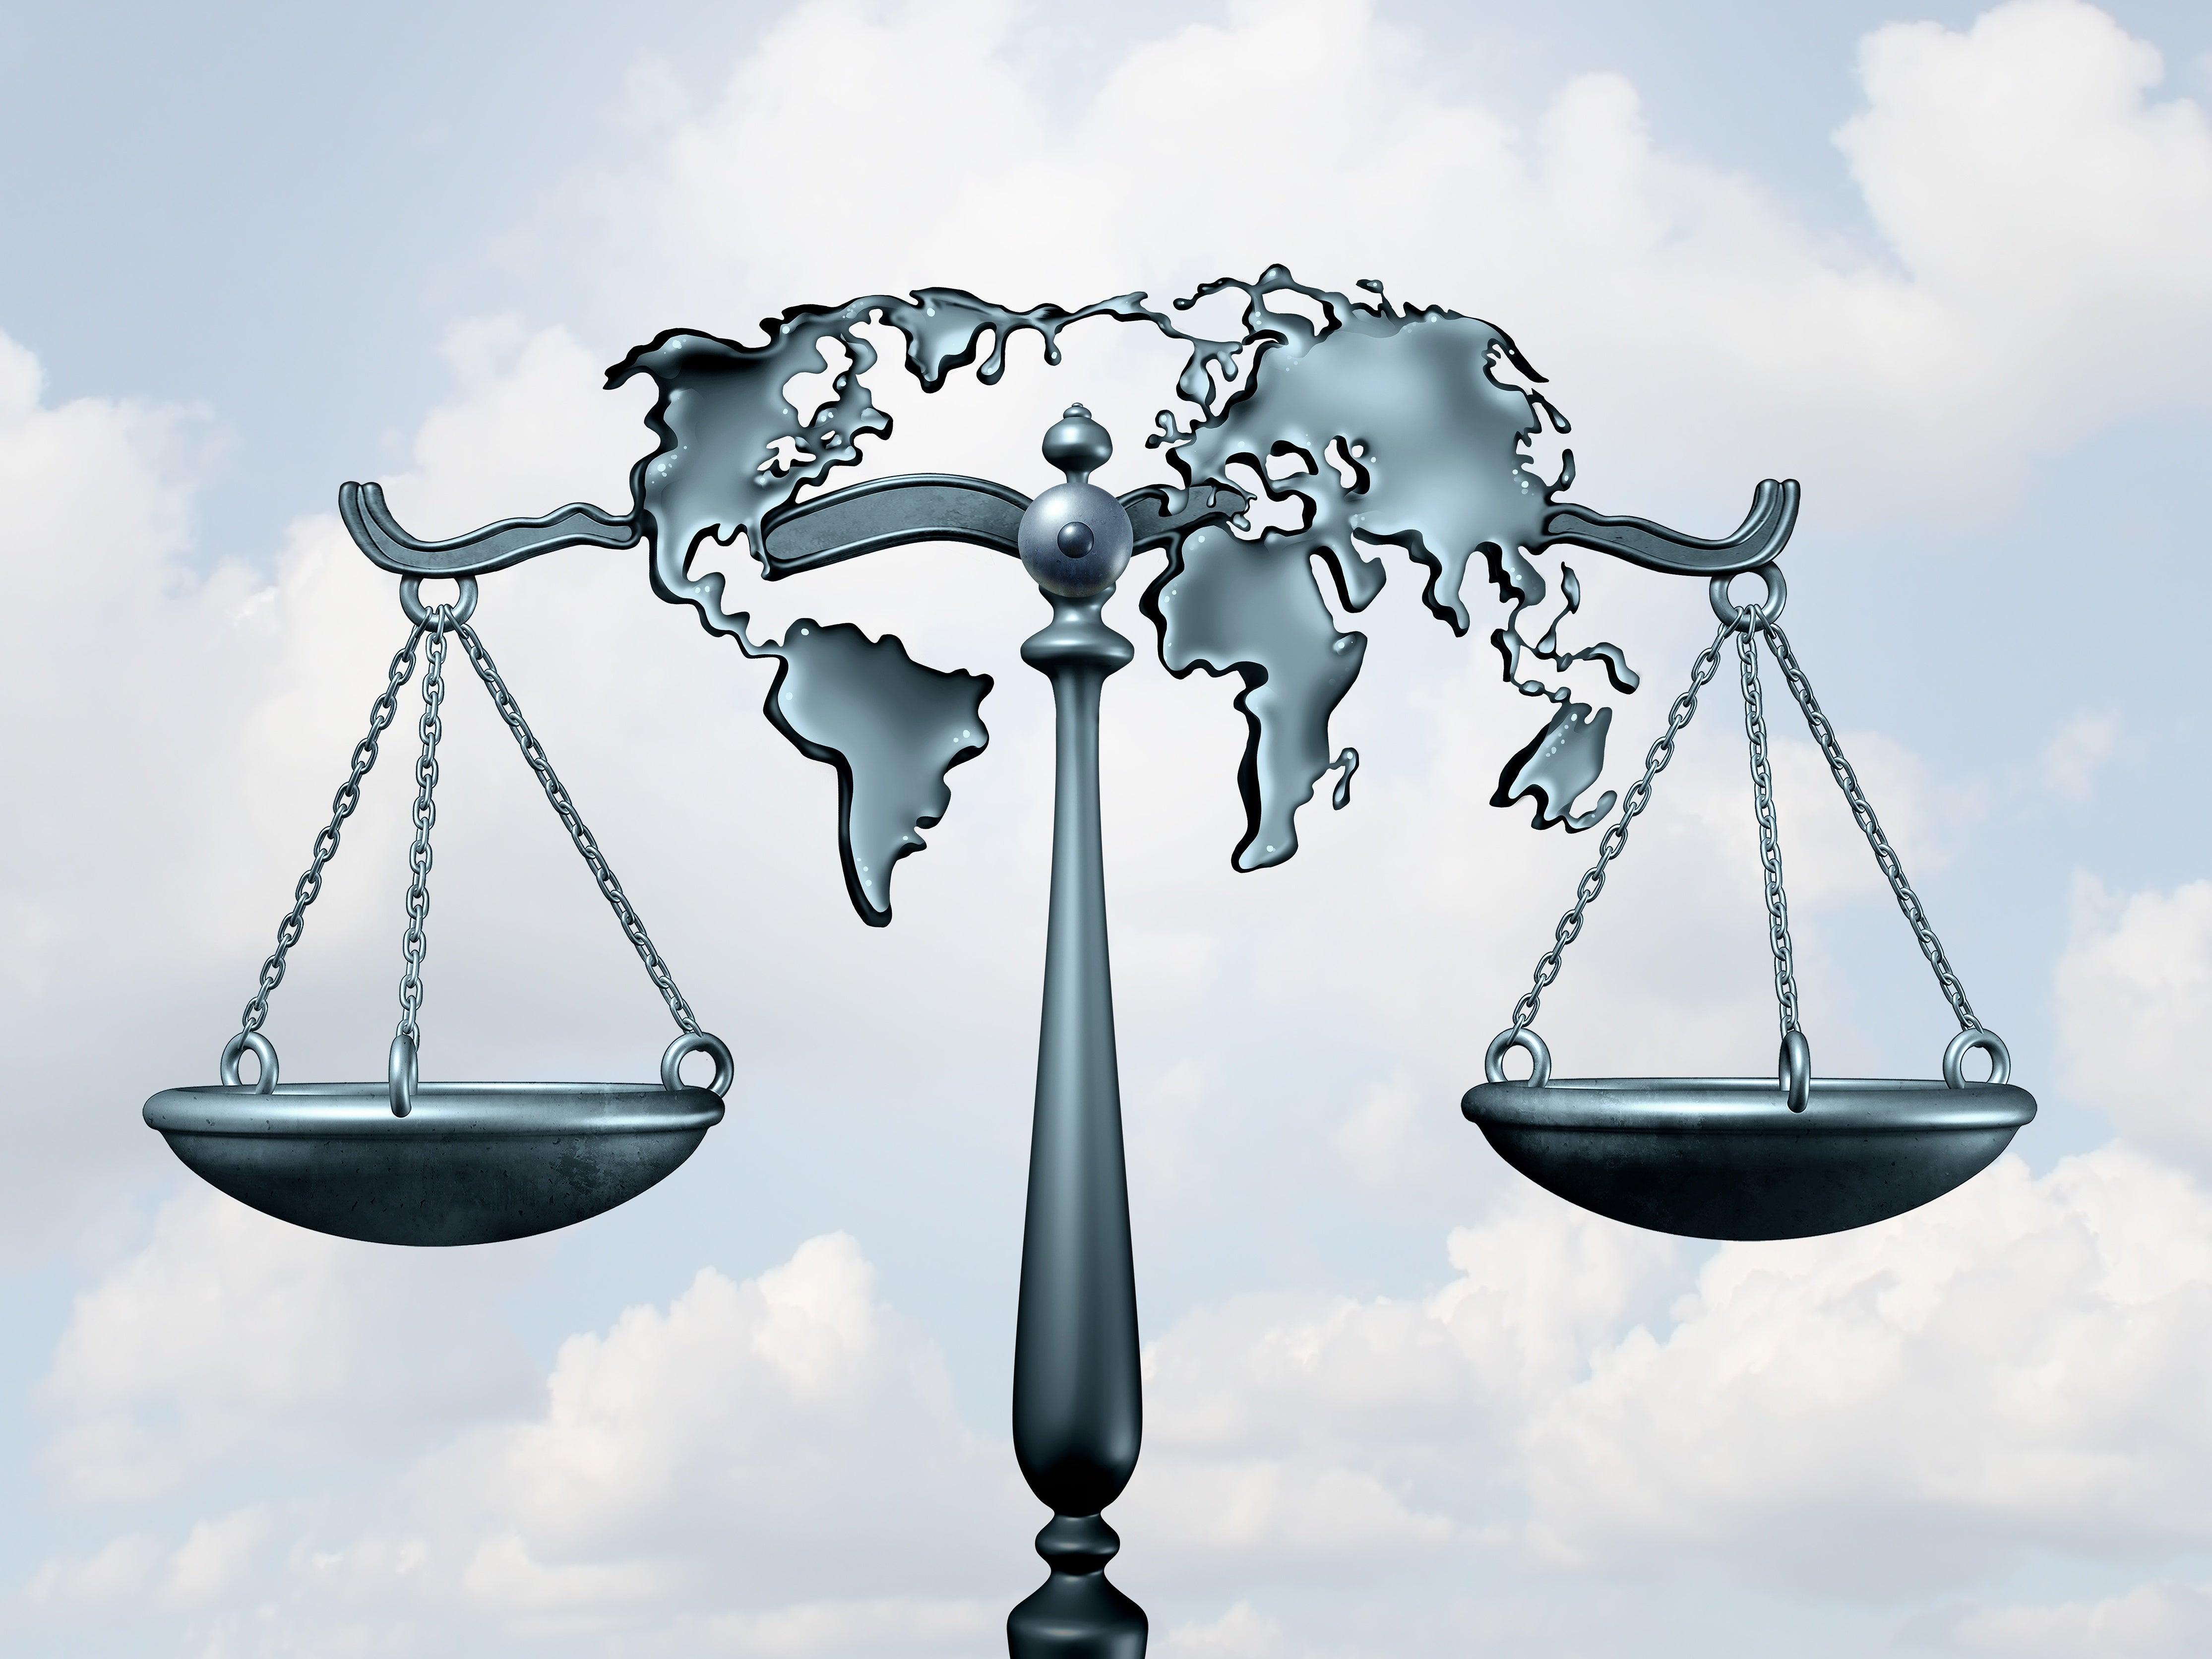 Dispute resolution across international borders: Should we be using arbitration?